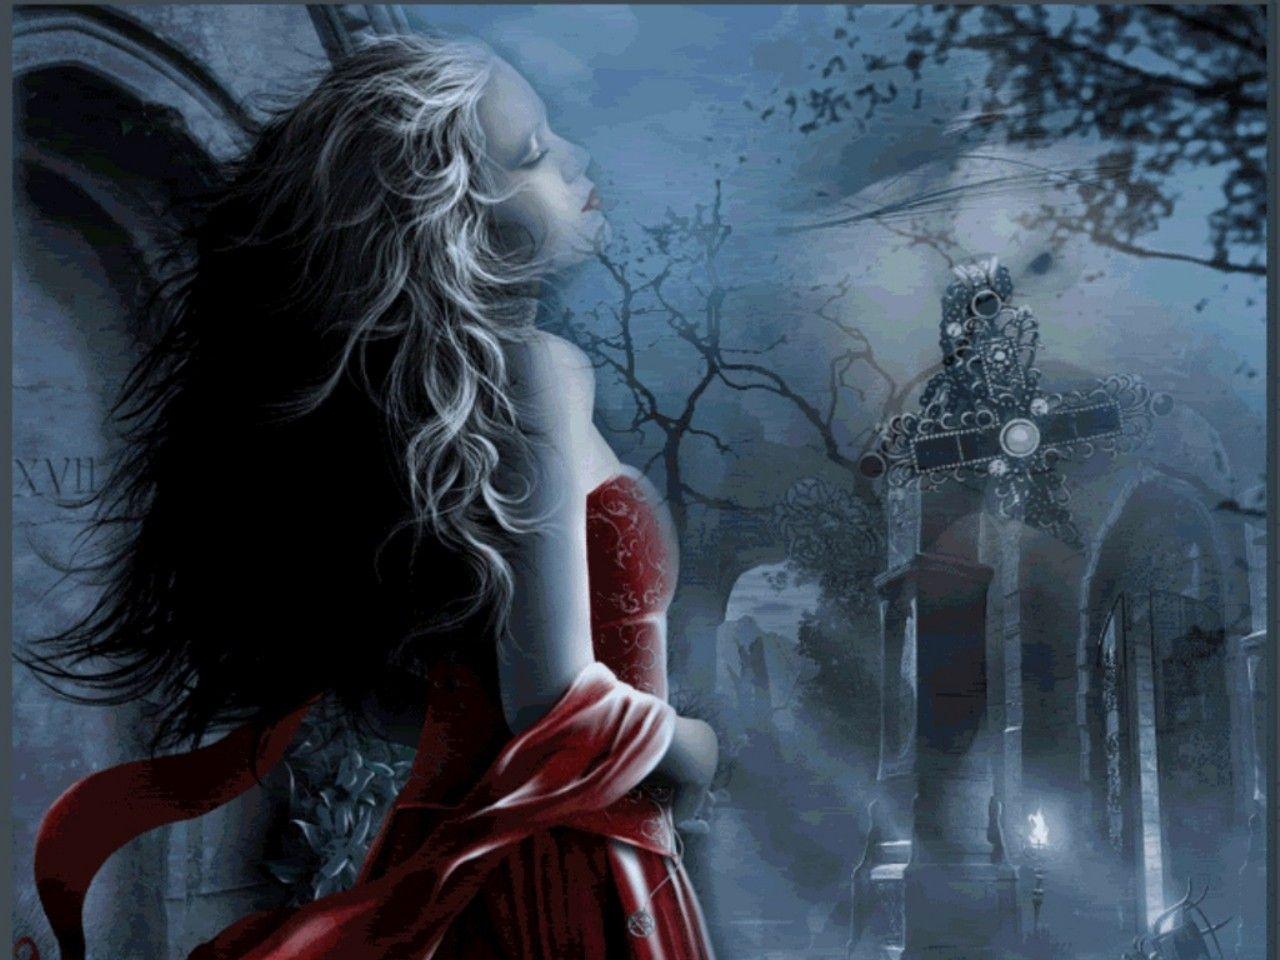 Gothic Fantasy Wallpaper Free Download Готическая